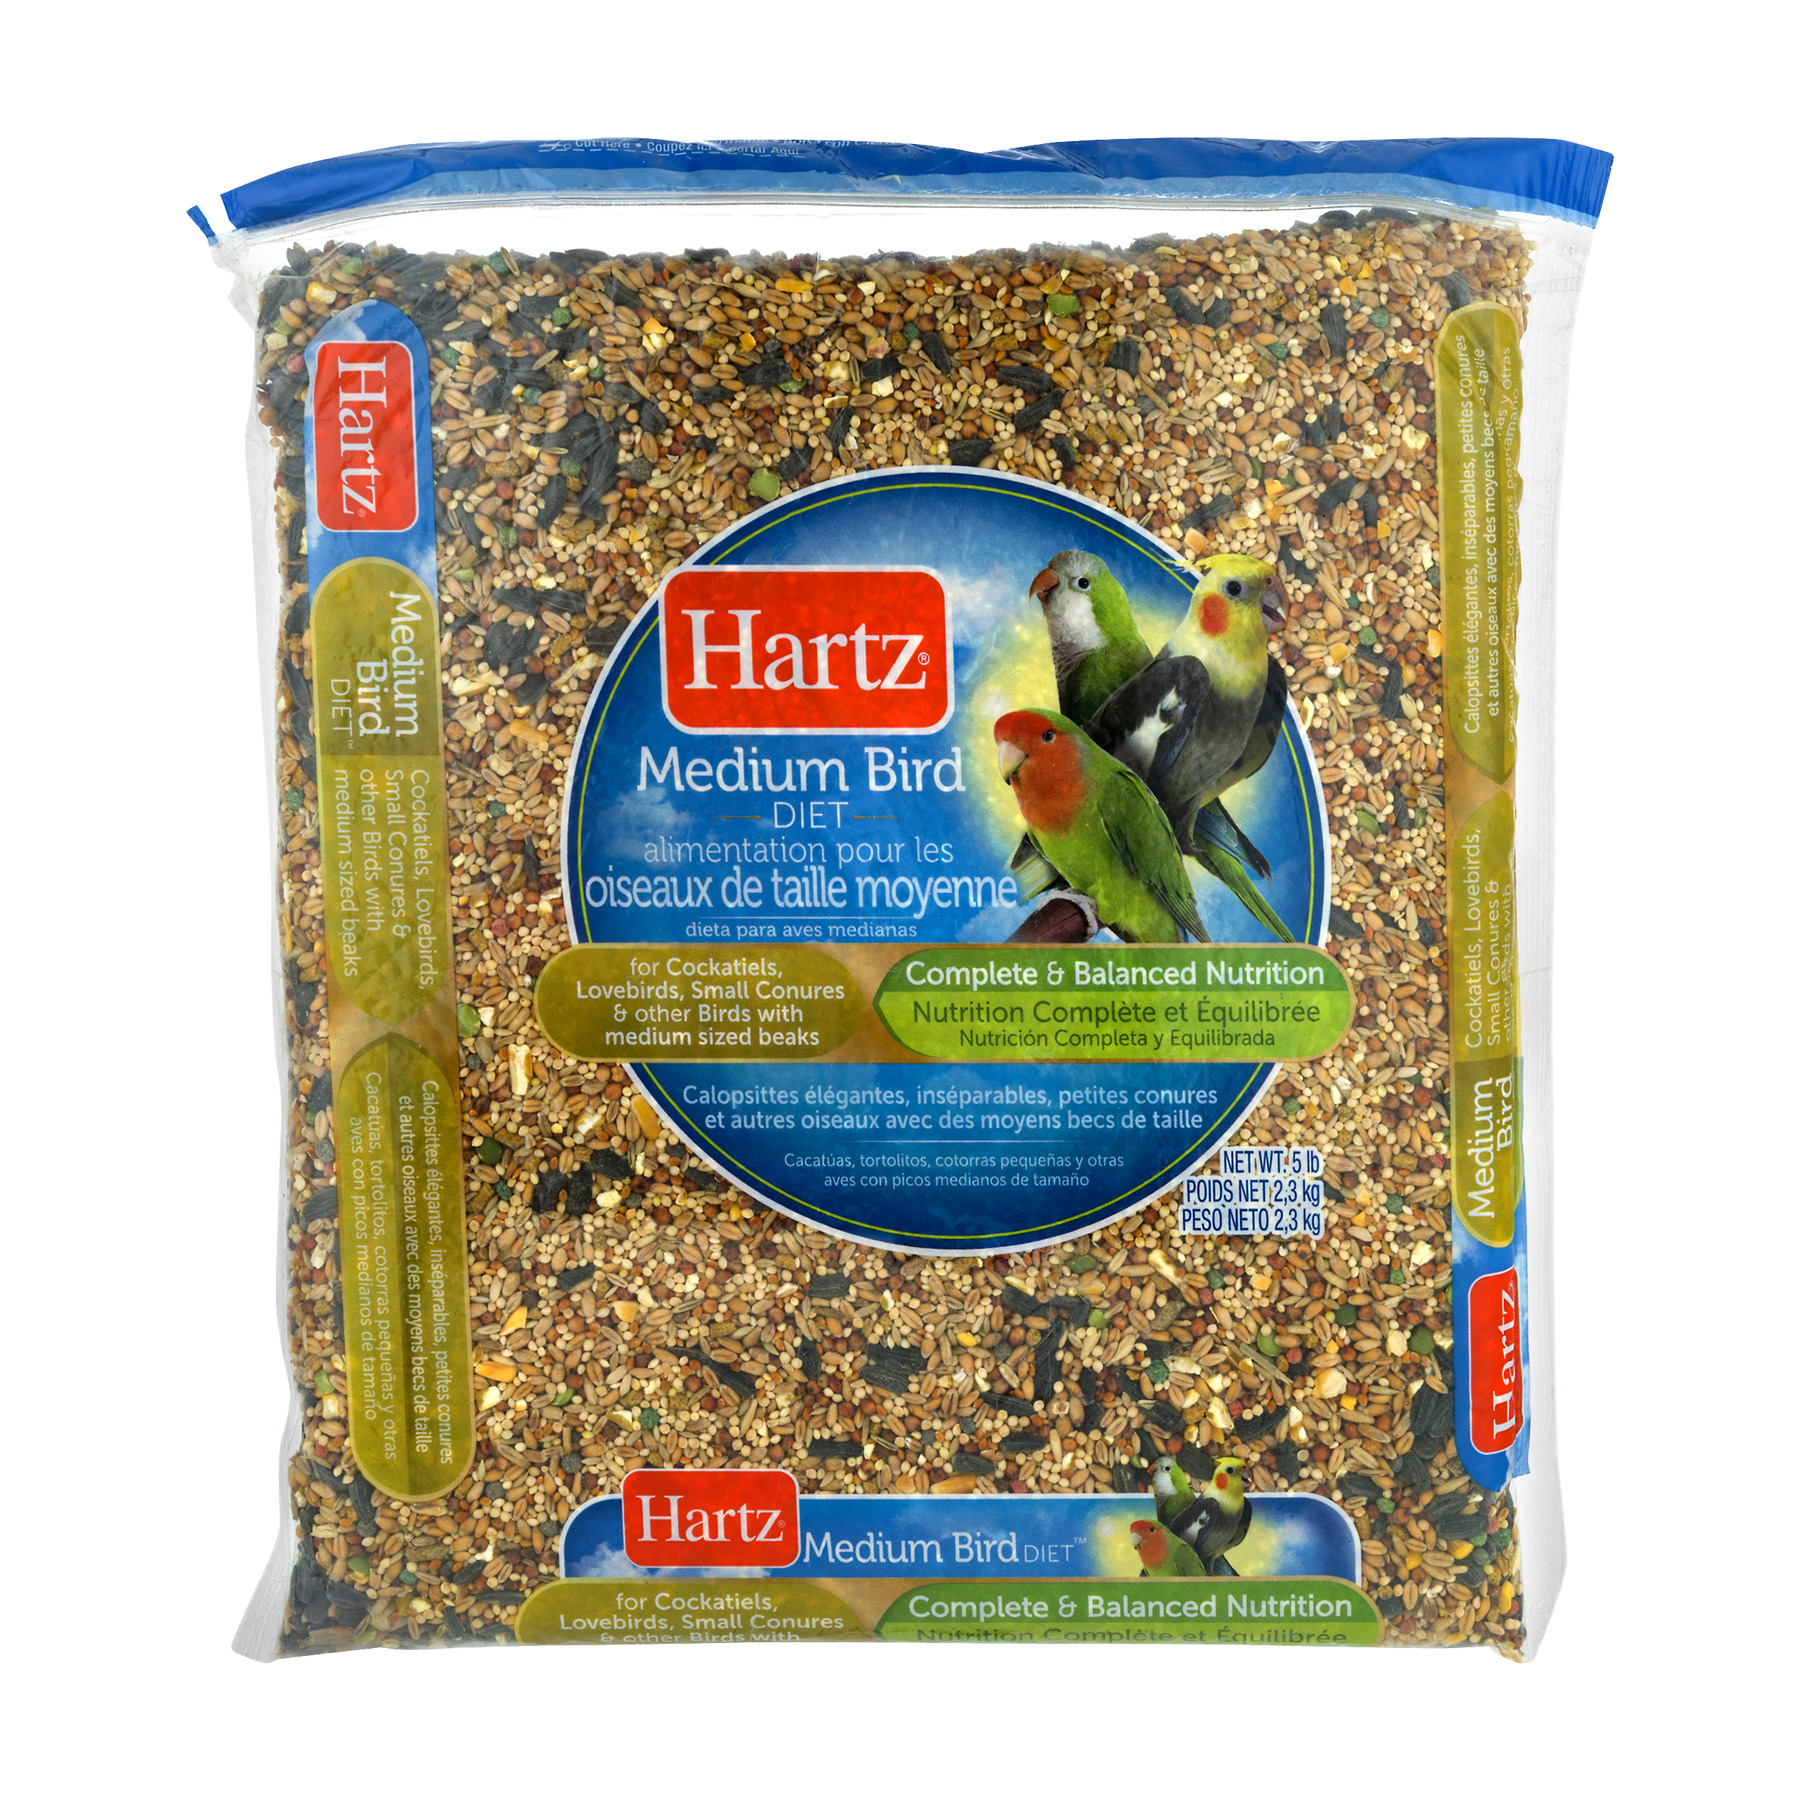 Hartz Medium Bird Food, 5.0 LB by The Hartz Mountain Corporation